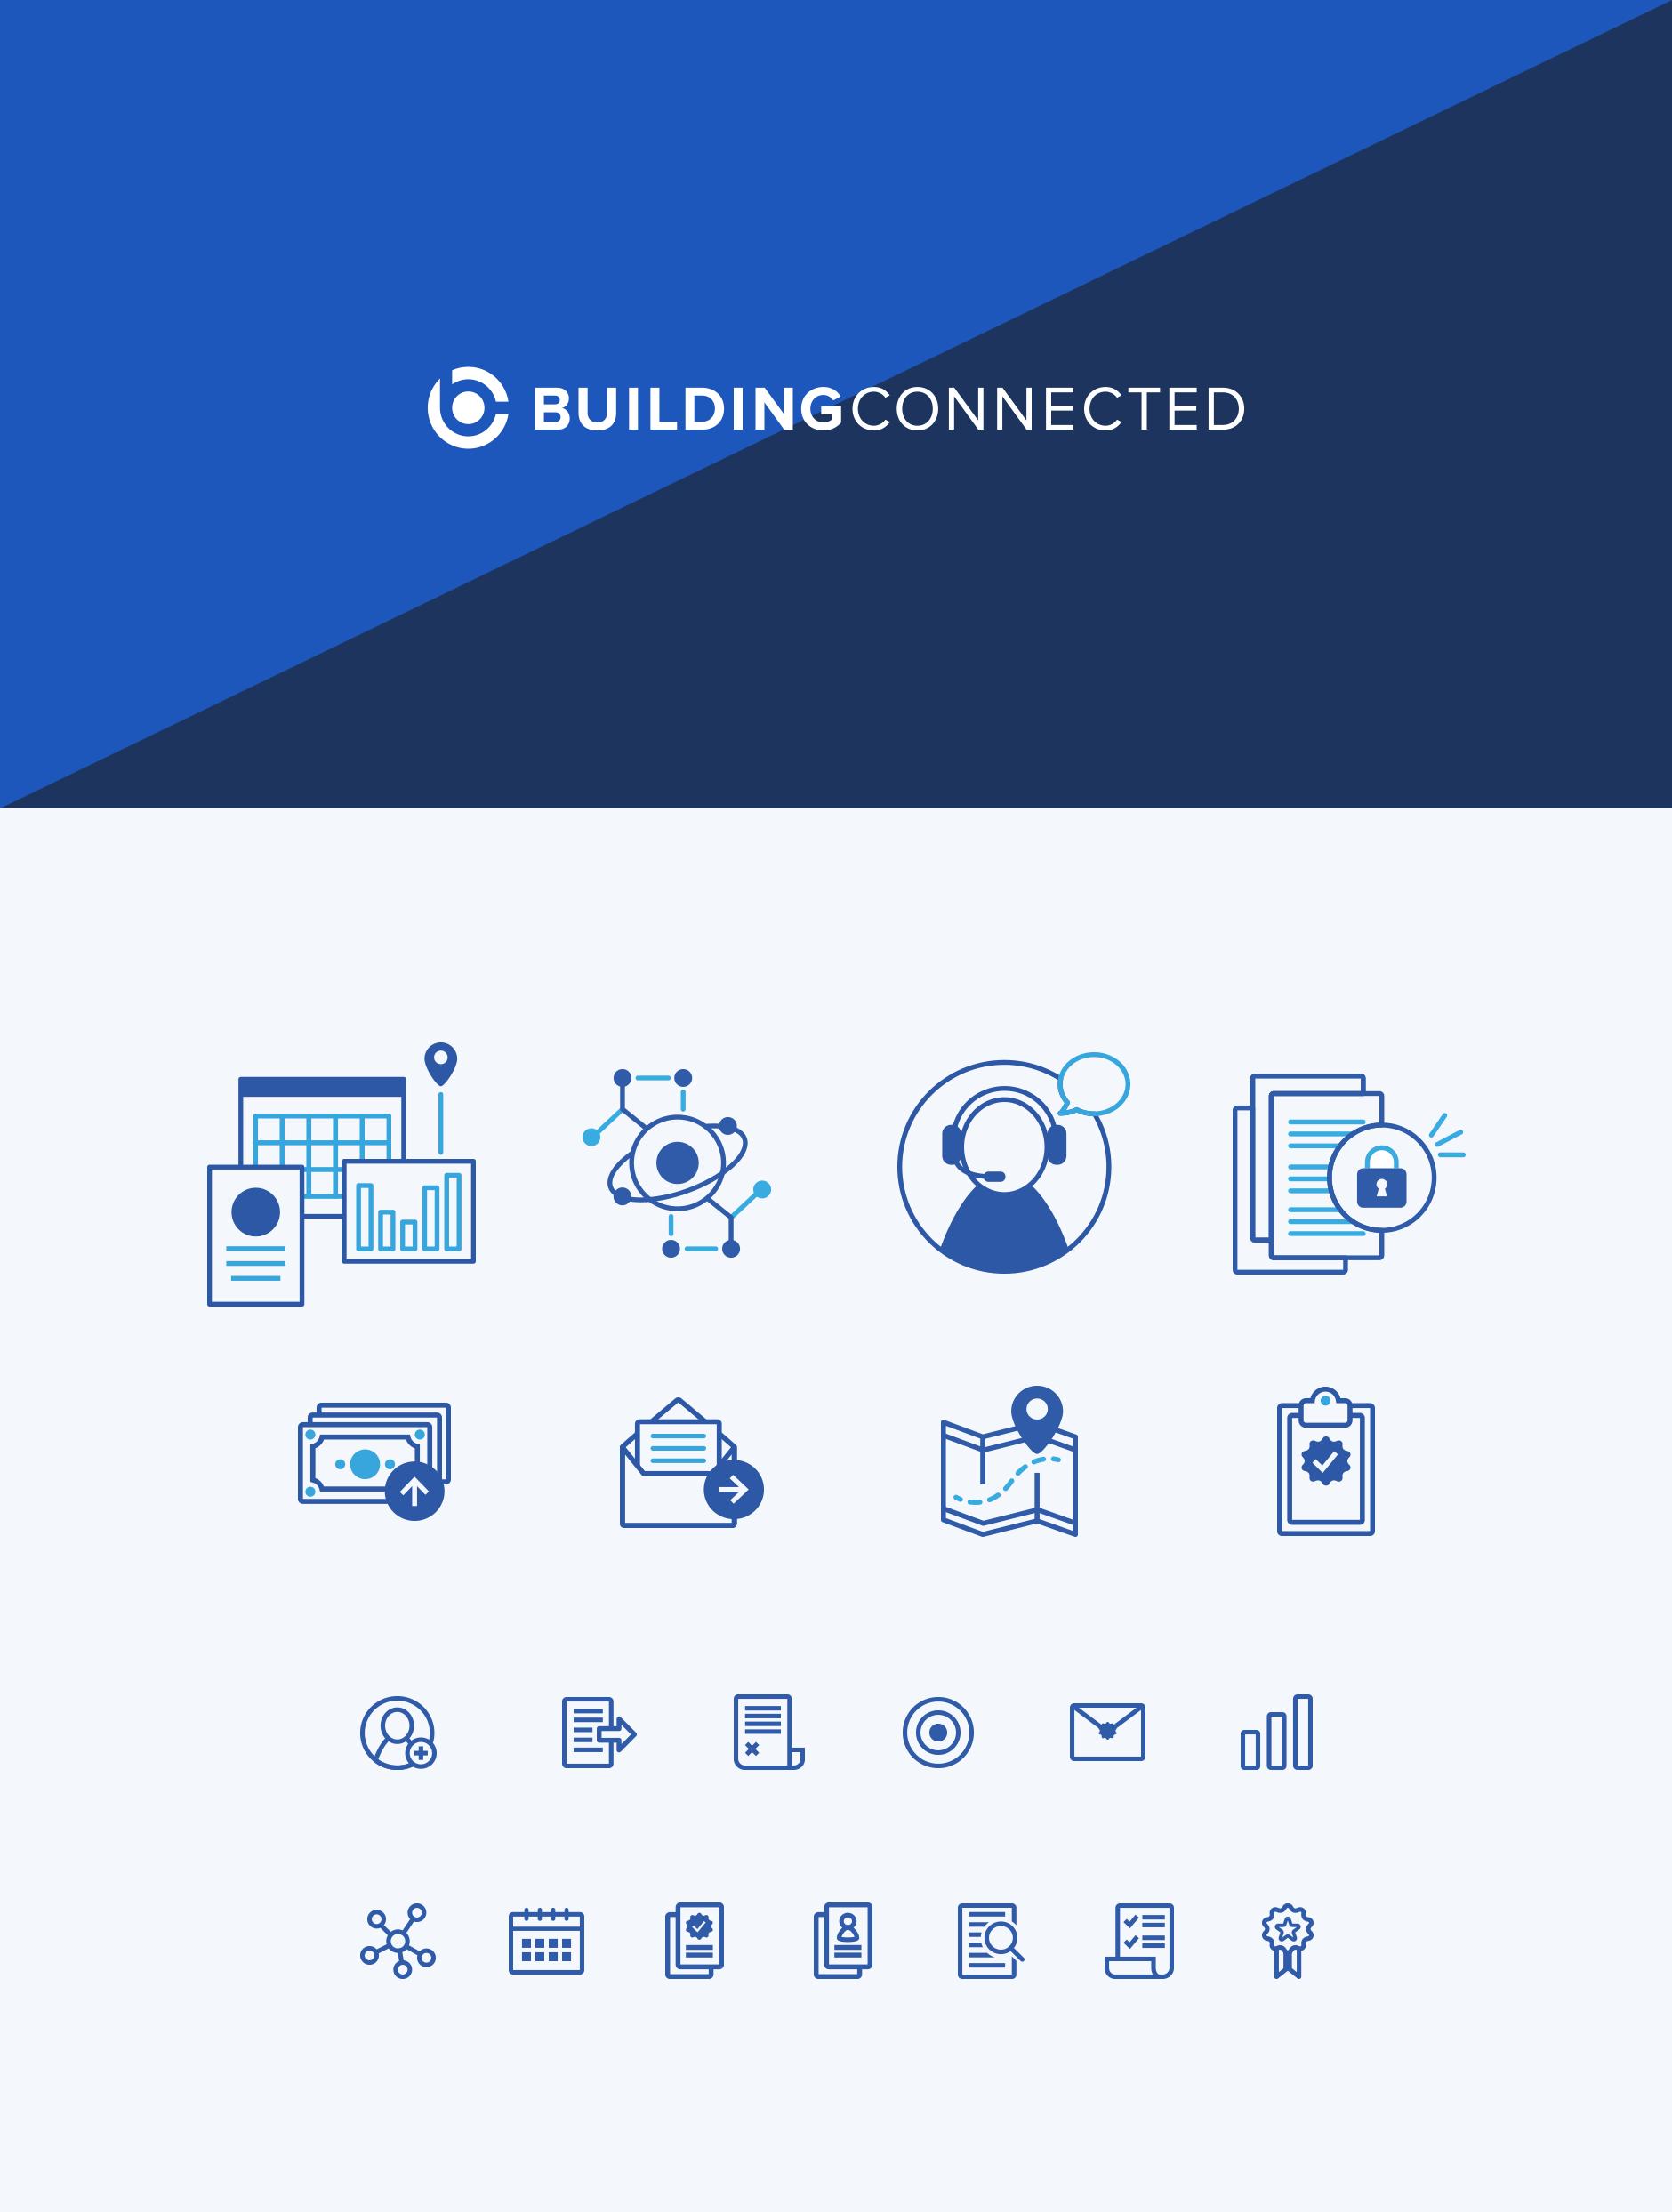 Salazar_BuildingConnected_Logo-Illlo-icon-allblue.png